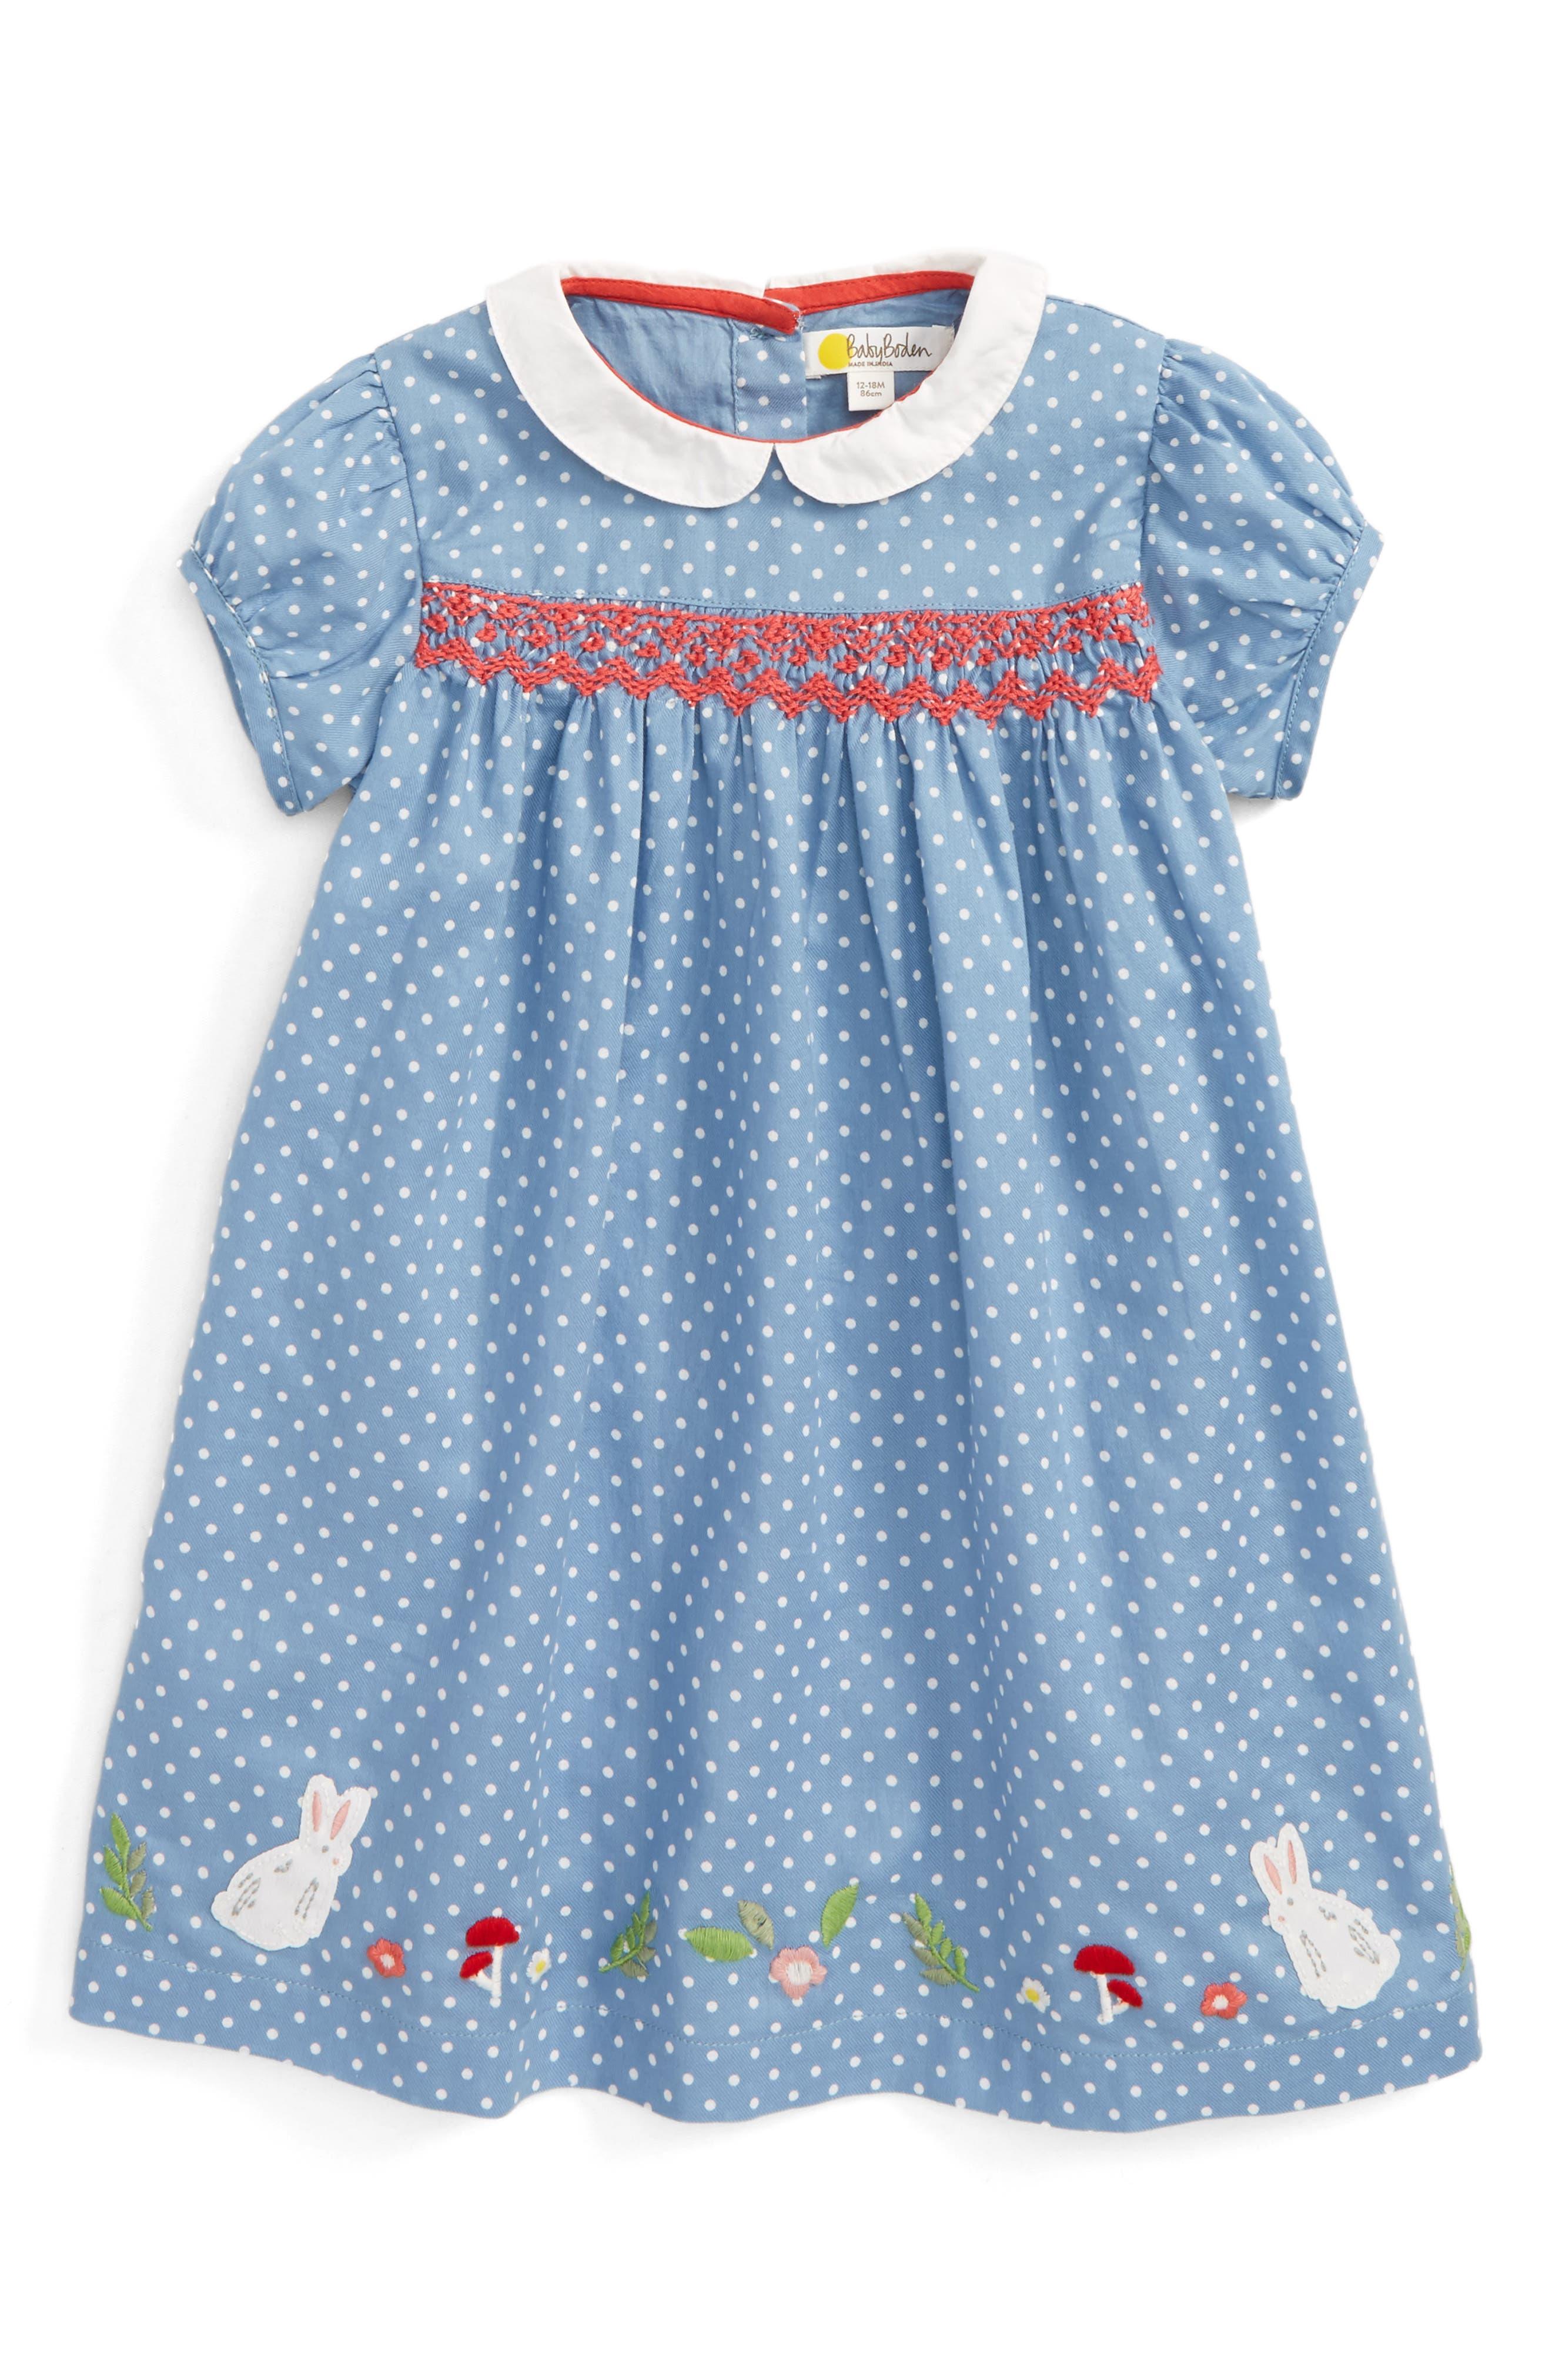 Main Image - Mini Boden Pretty Print Smocked Dress (Baby Girls & Toddler Girls)